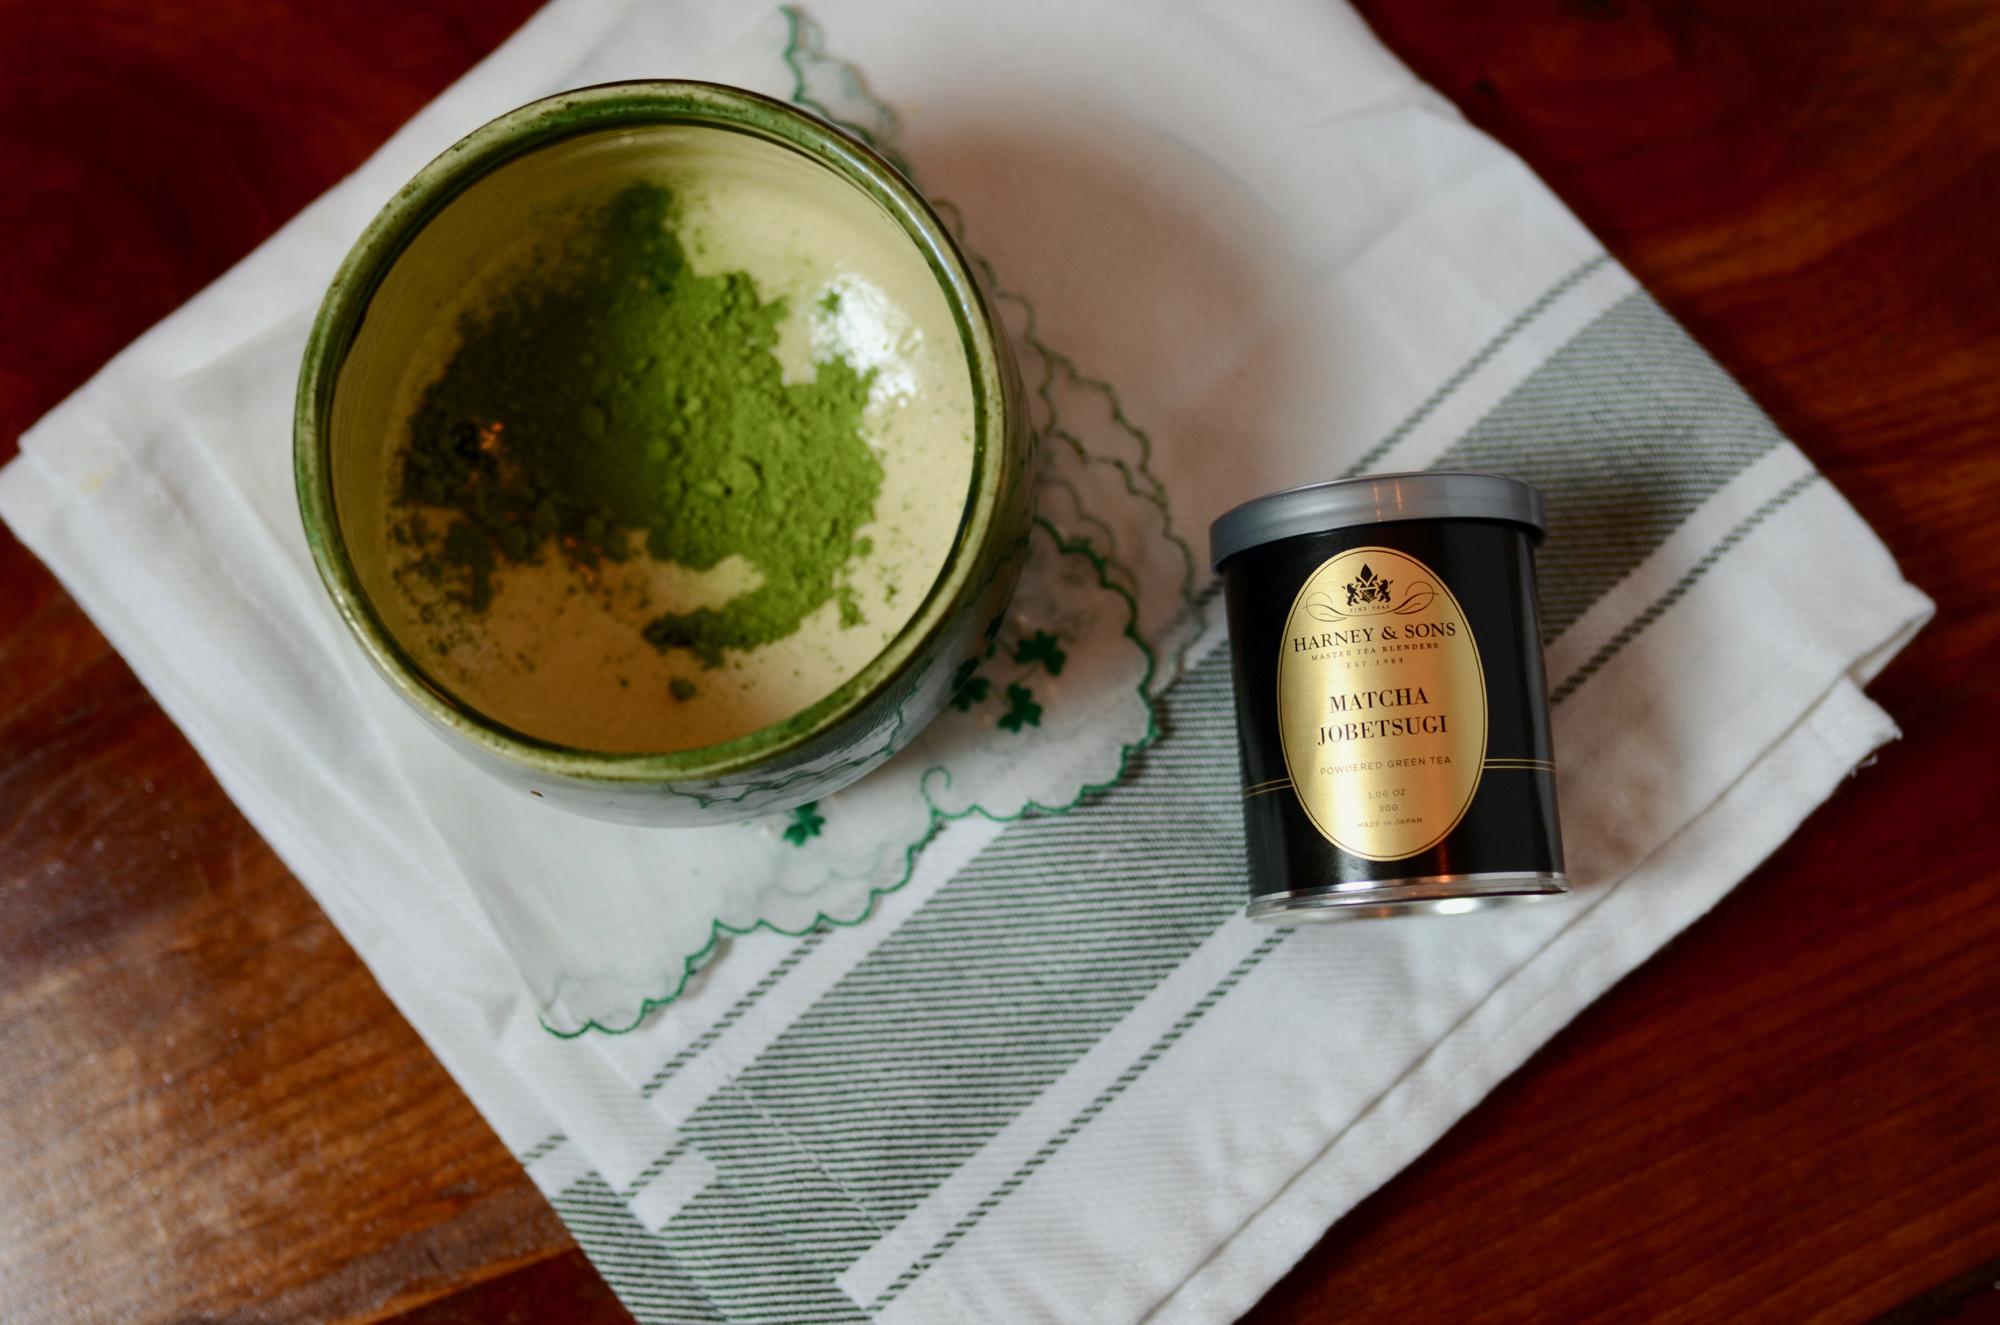 Green matcha powder in a ceramic bowl